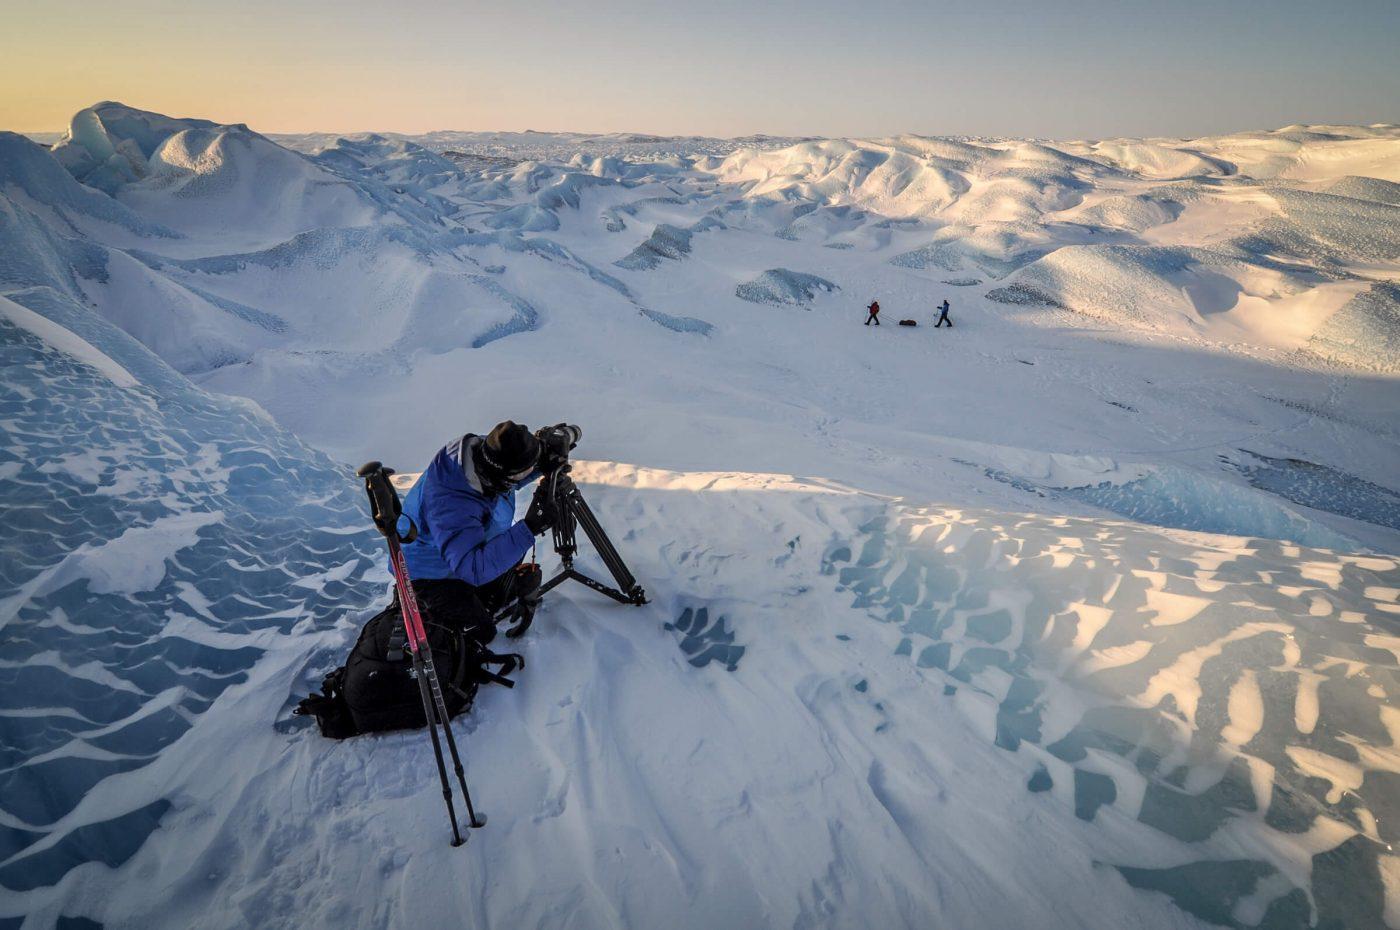 A photo tour on the Greenland Ice Sheet near Kangerlussuaq